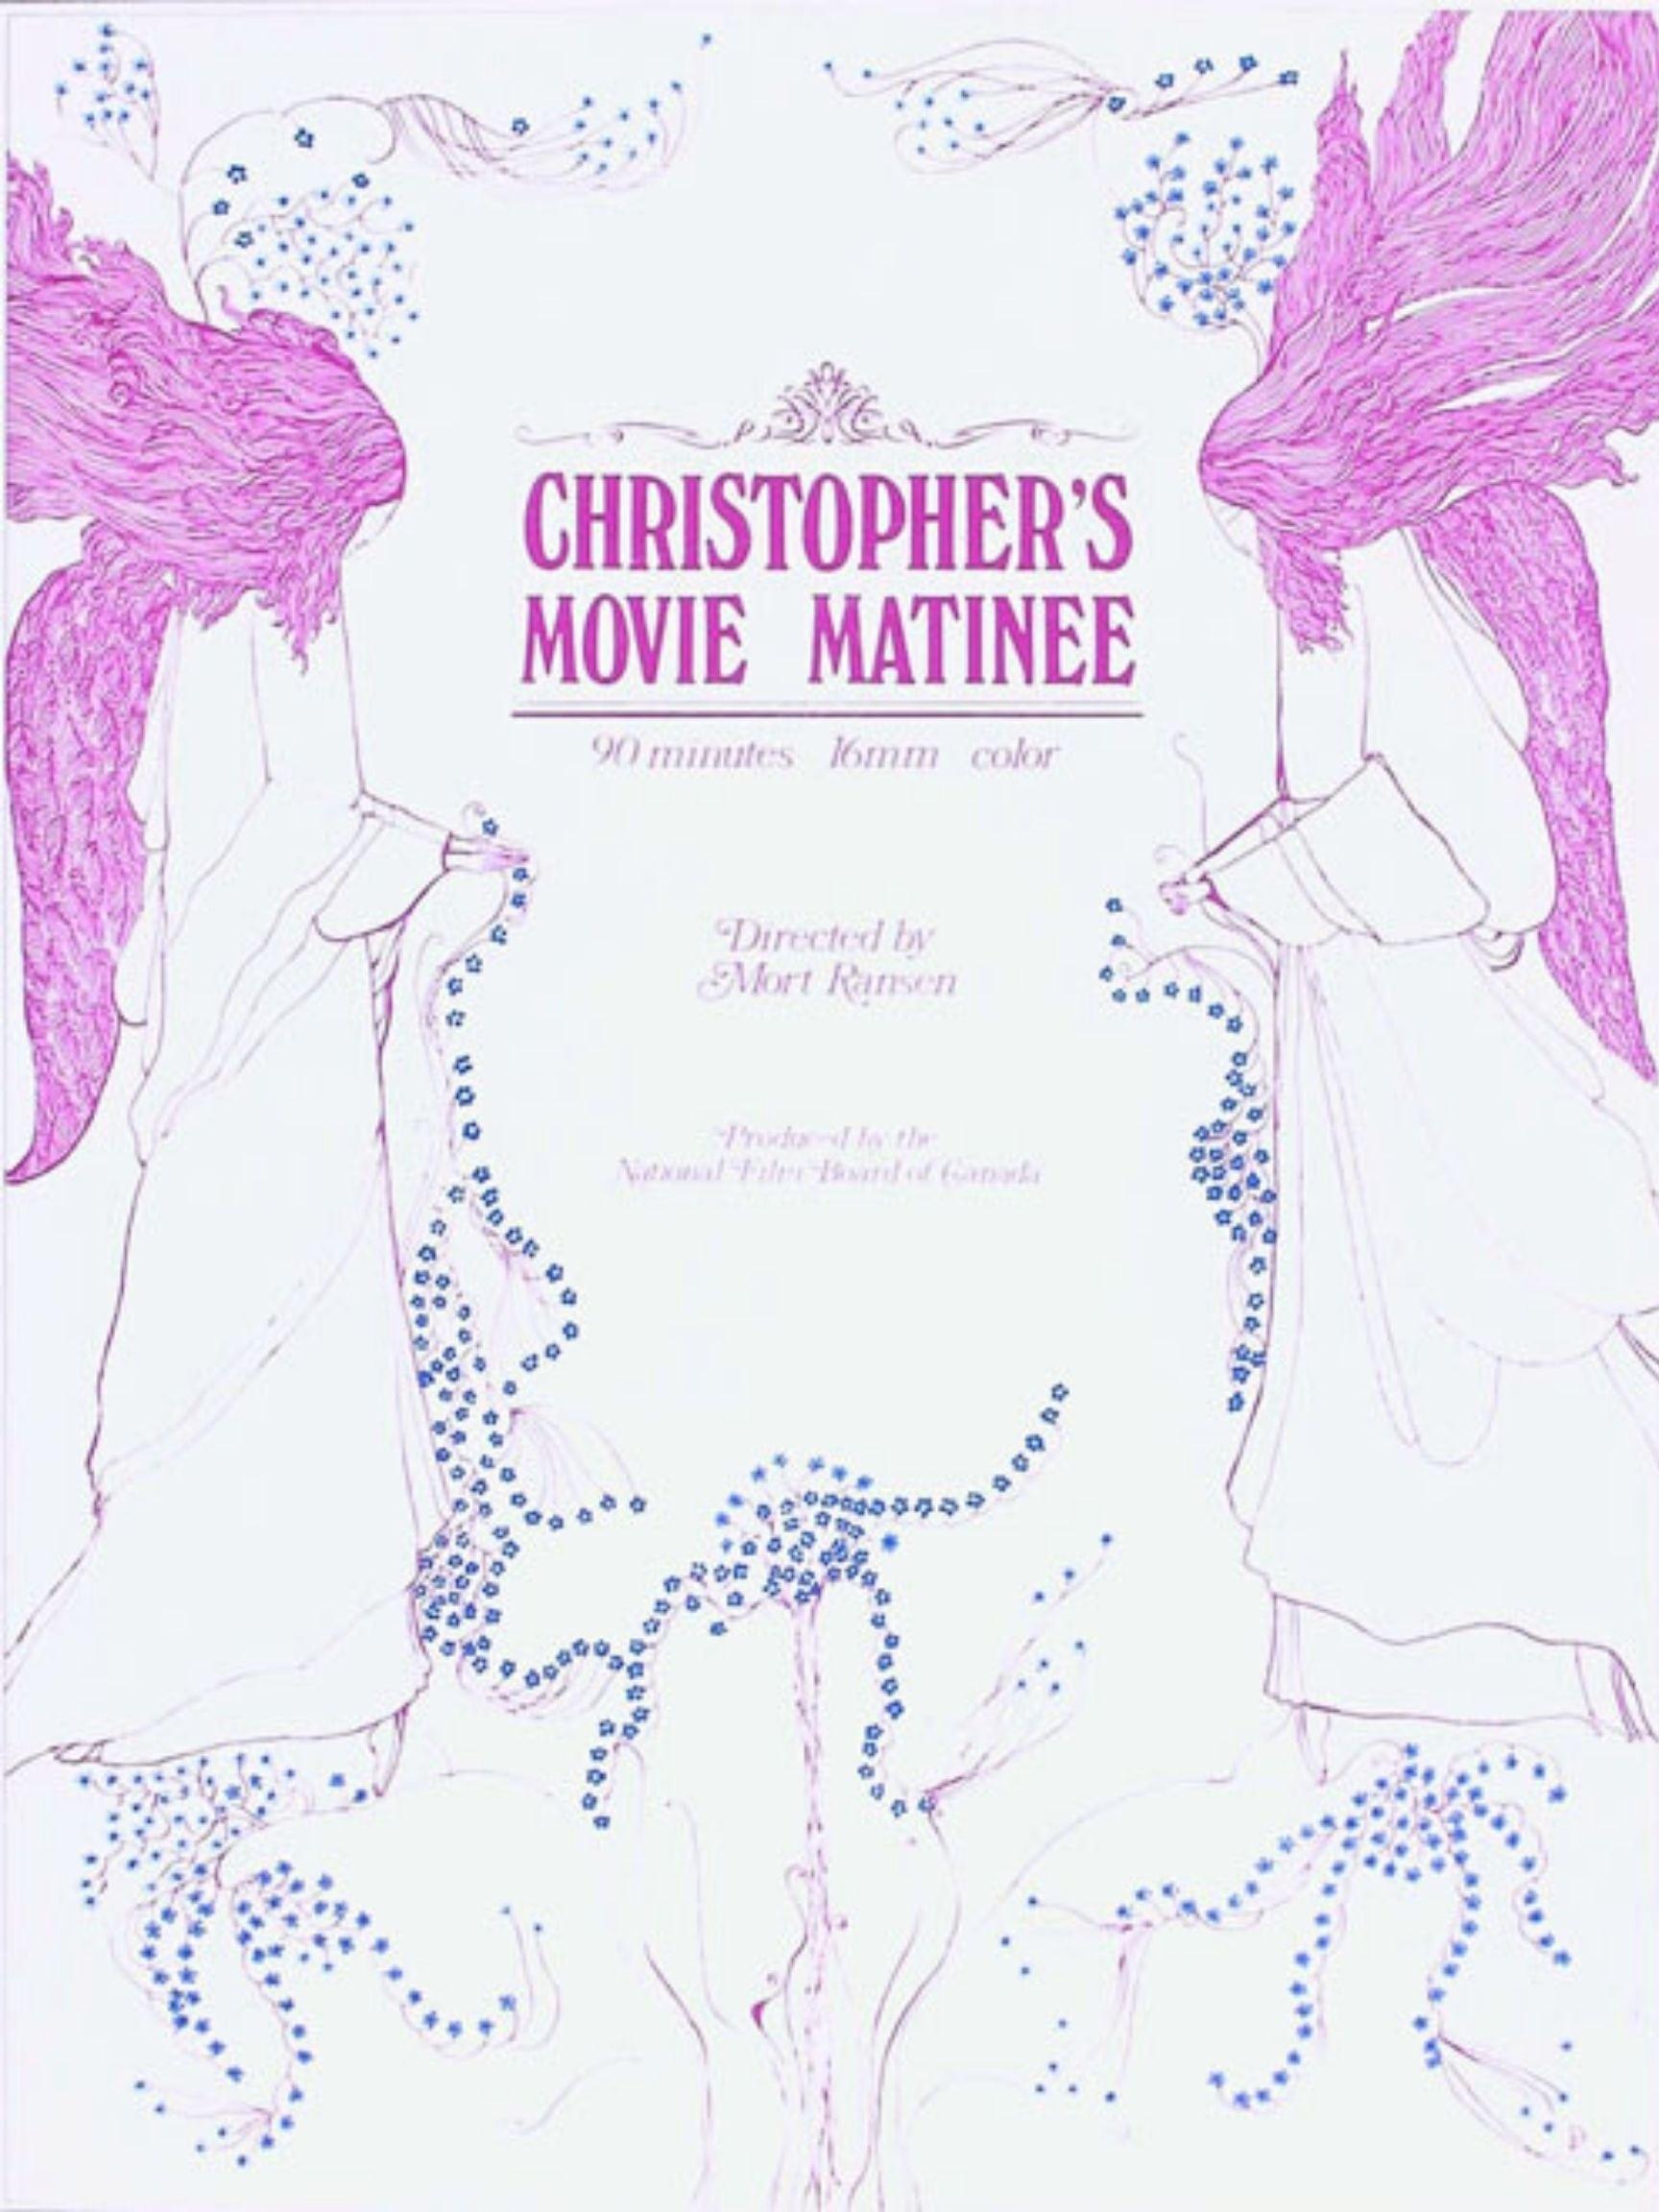 Christopher's Movie Matinee